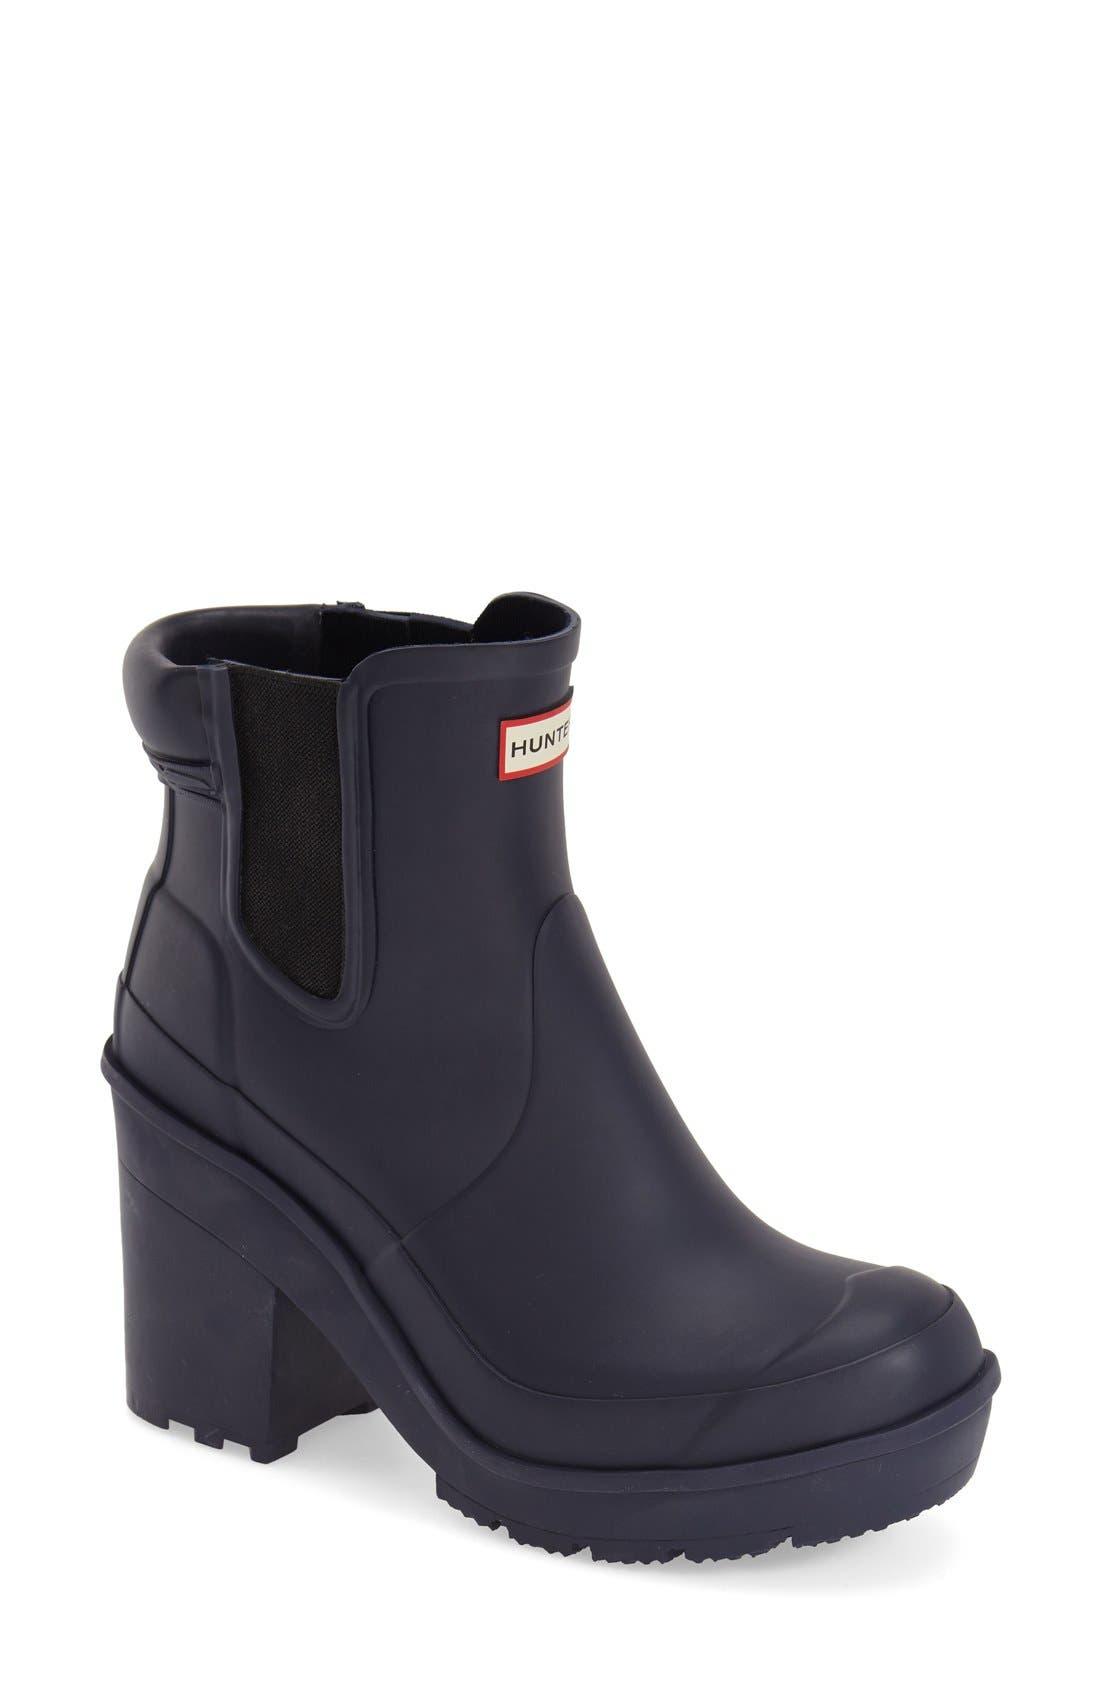 Main Image - Hunter 'Original - Block Heel' Chelsea Rain Boot (Women)